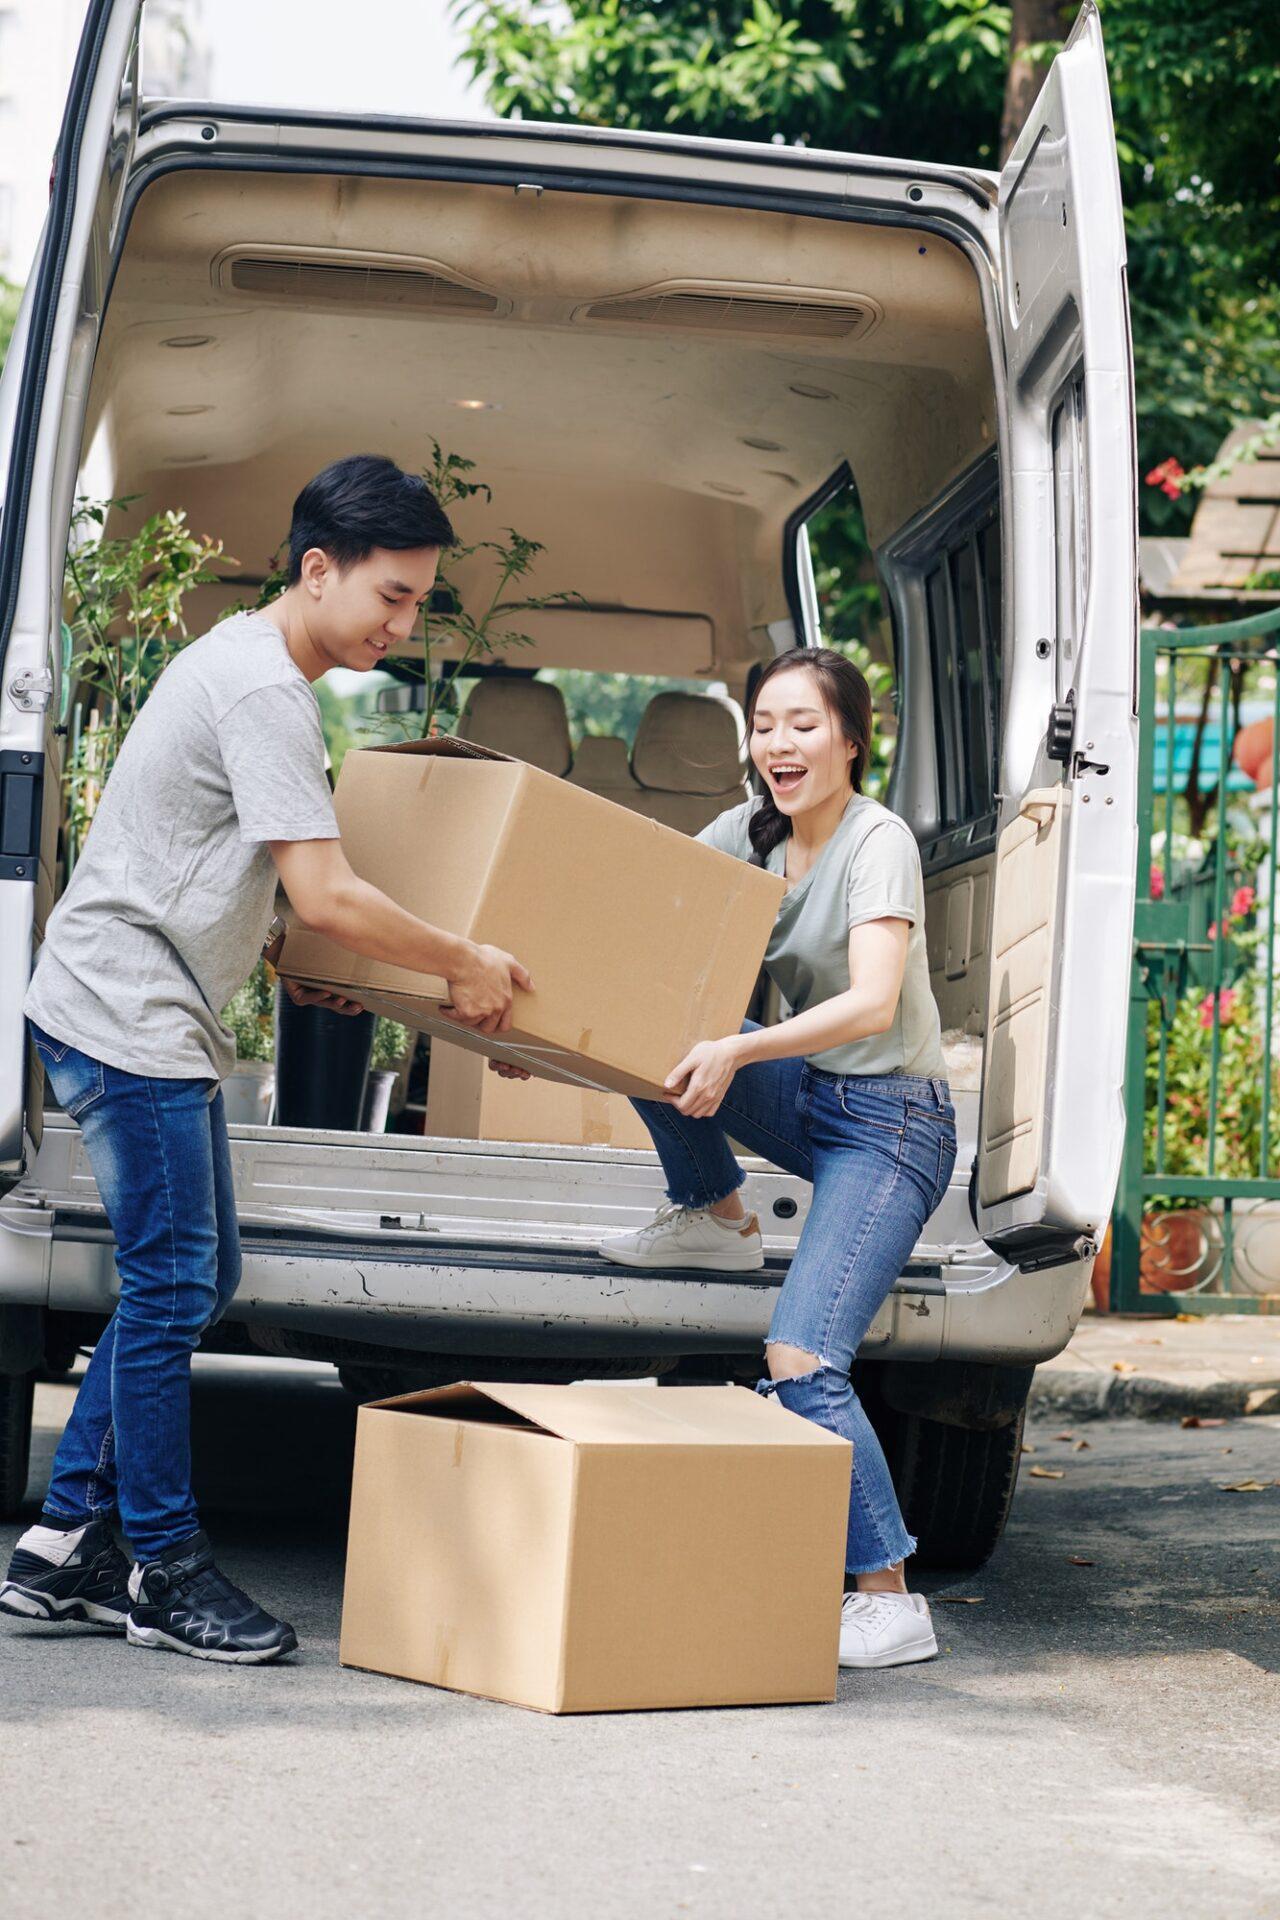 Couple unloading truck